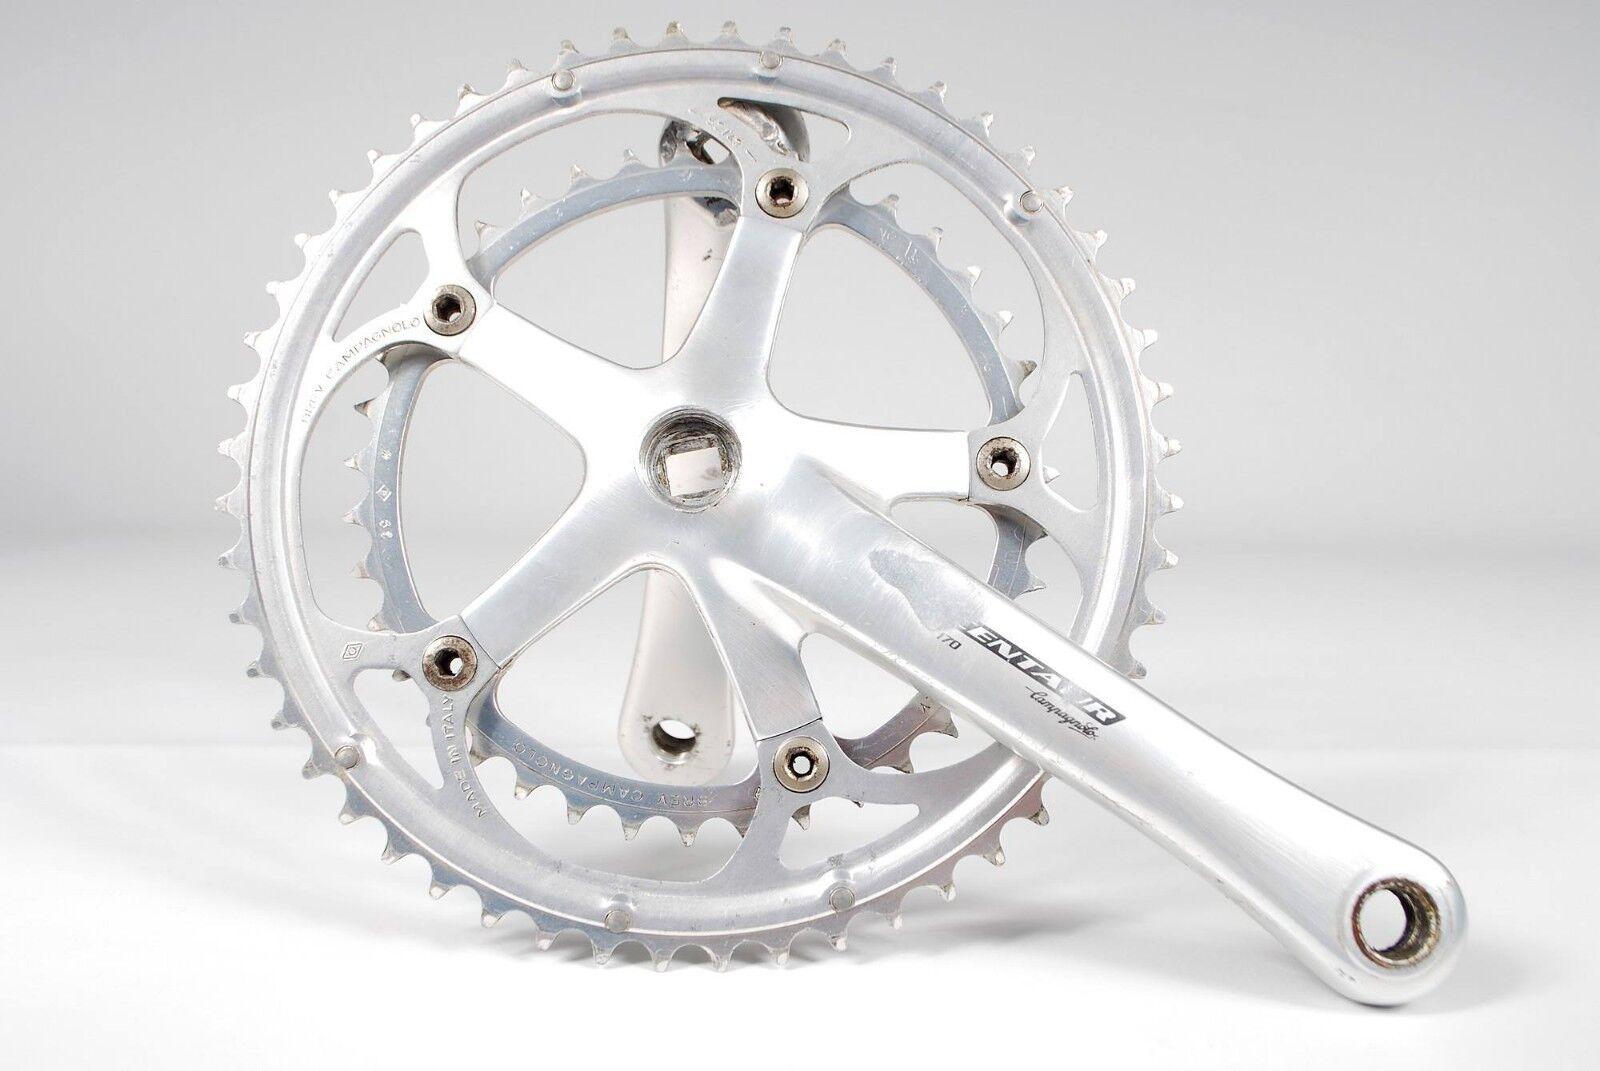 Campagnolo Centaur Road Bike Crankset 170mm BCD 135mm 52 39T Double